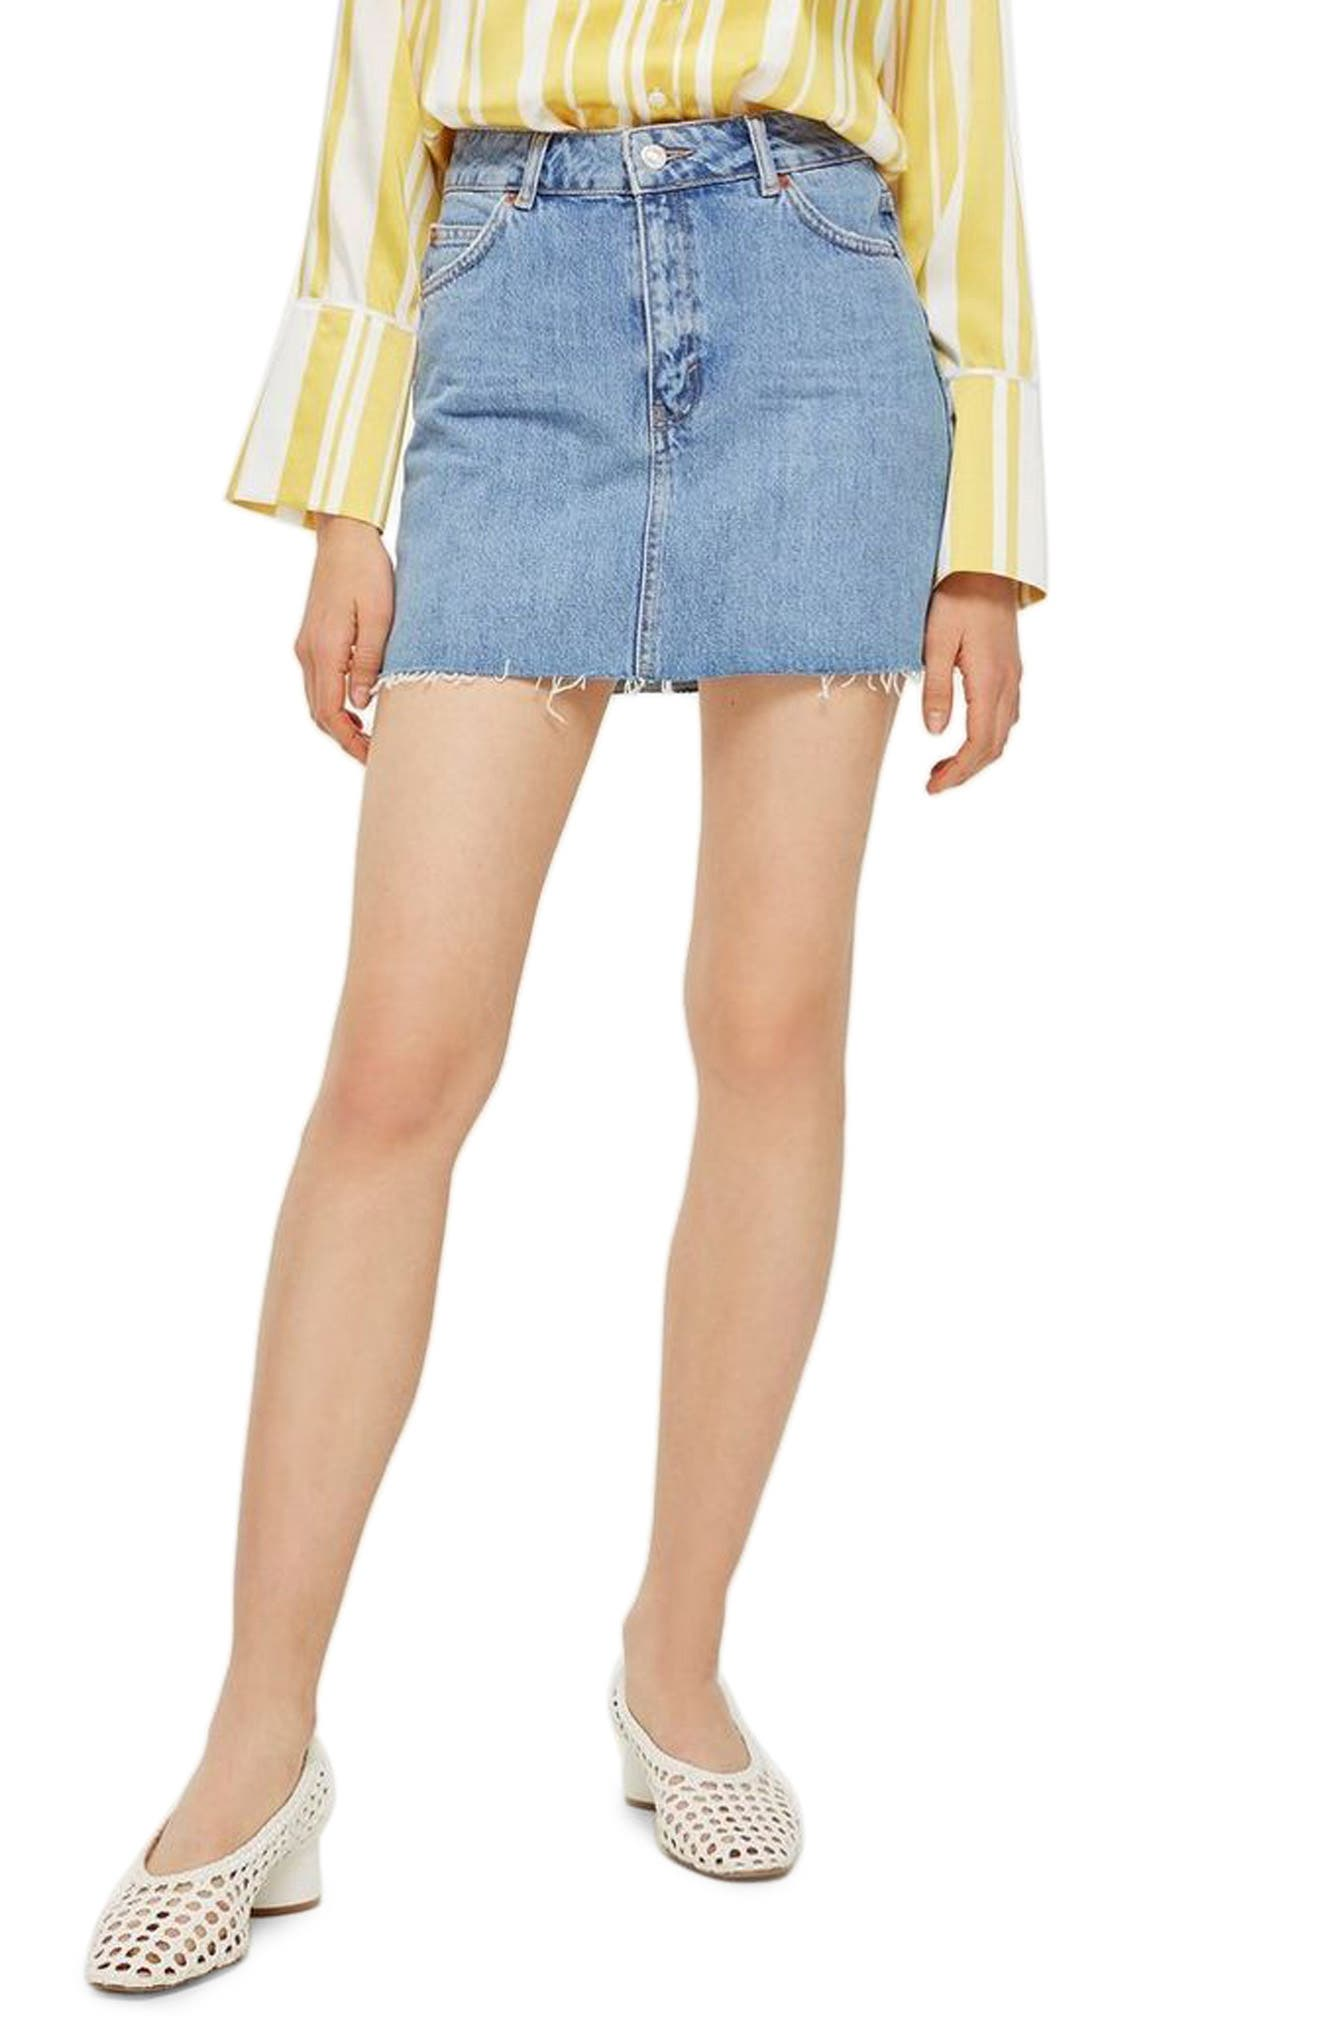 Topshop Denim Miniskirt, US (fits like 10-12) - Blue